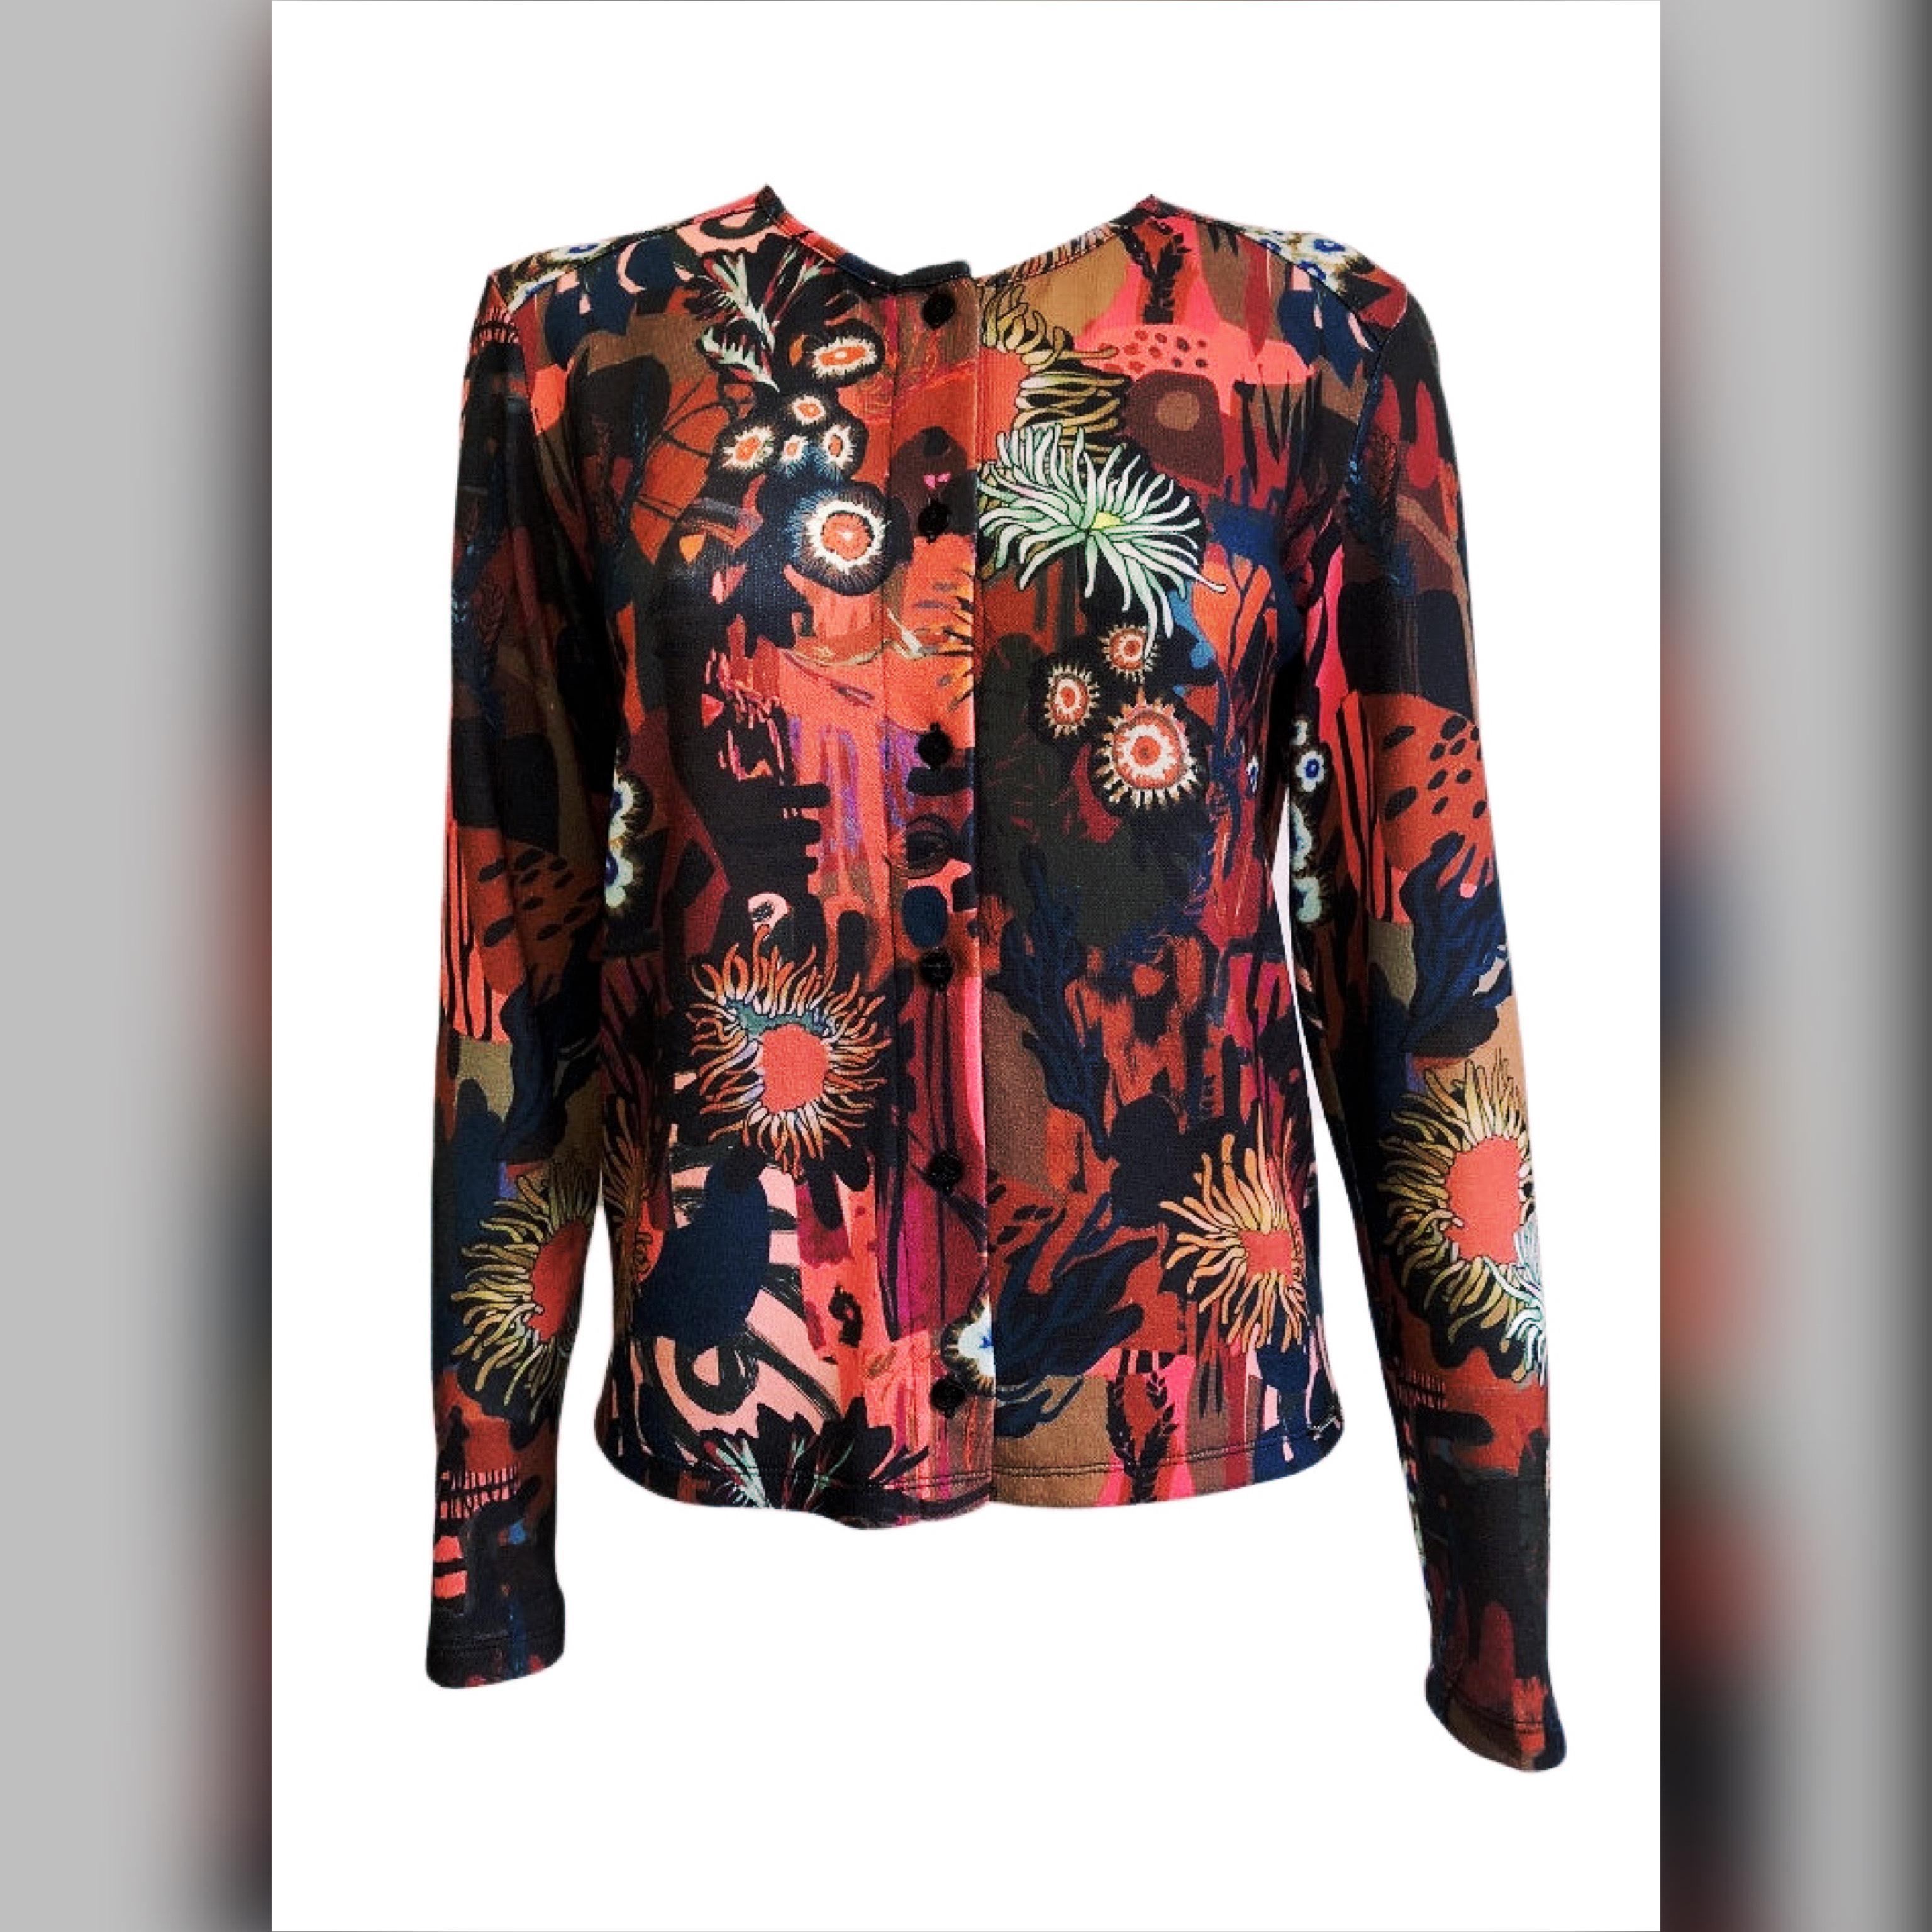 Maloka: Sedona Rock Abstract Art Buttoned Cardigan (More Colors!) MK_ELGA